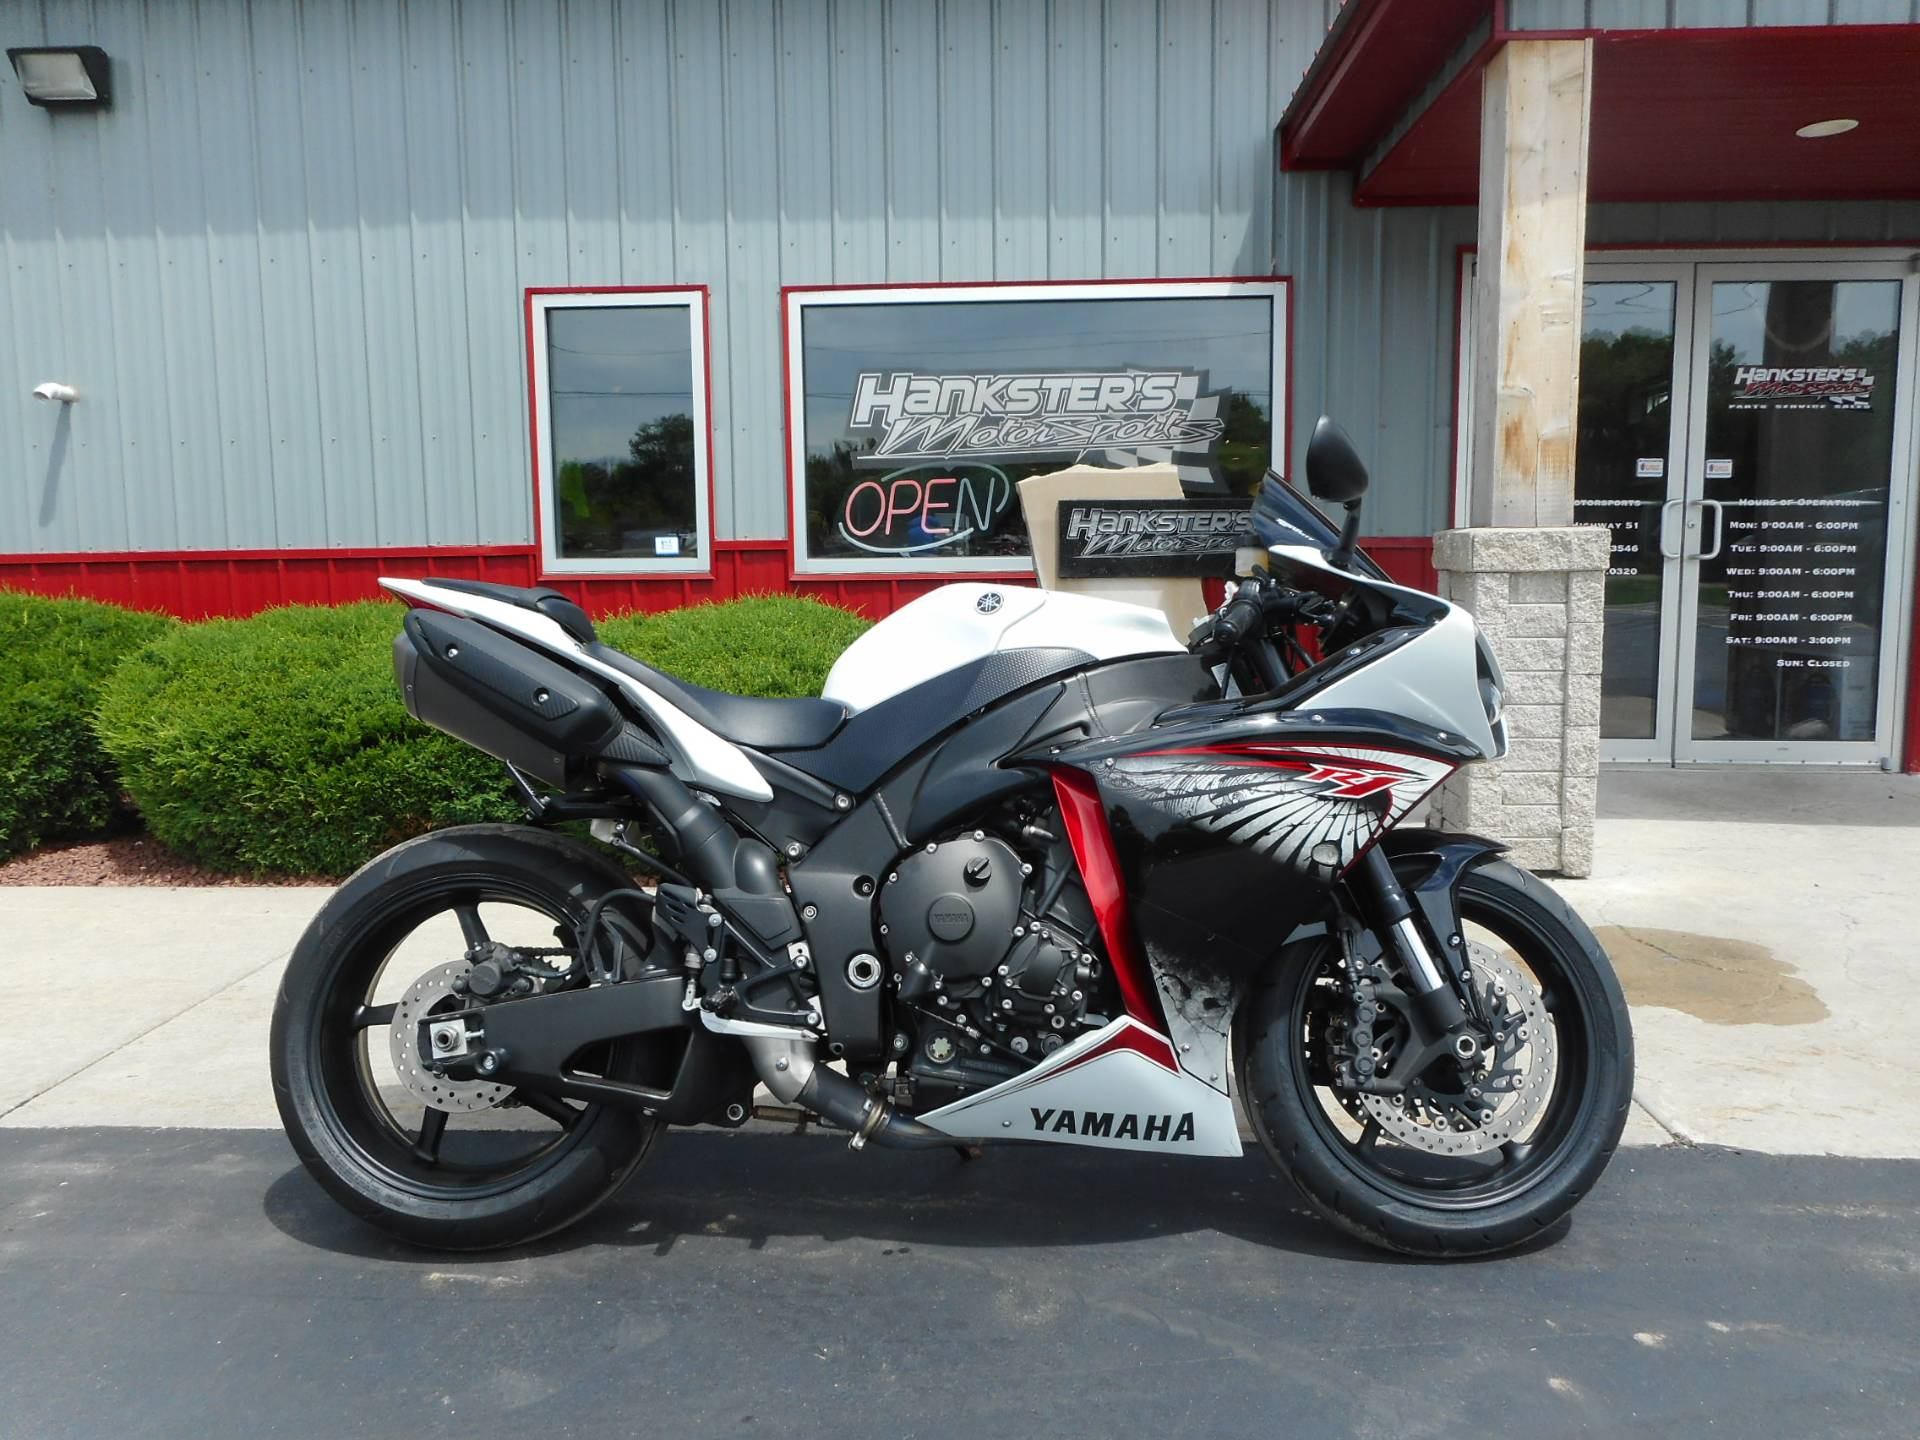 2012 Yamaha YZF-R1 for sale 142978